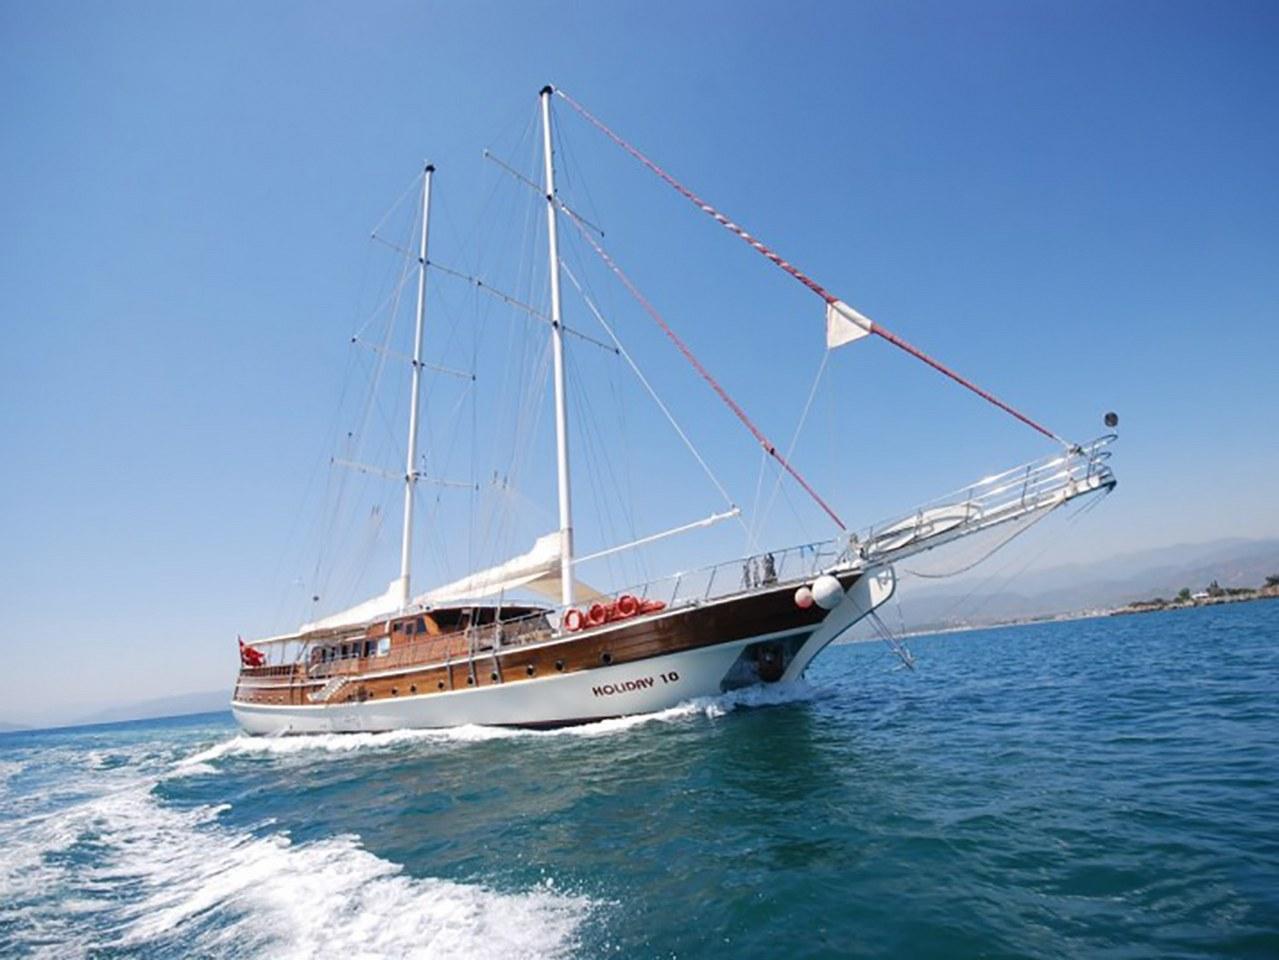 Yacht Holiday 10